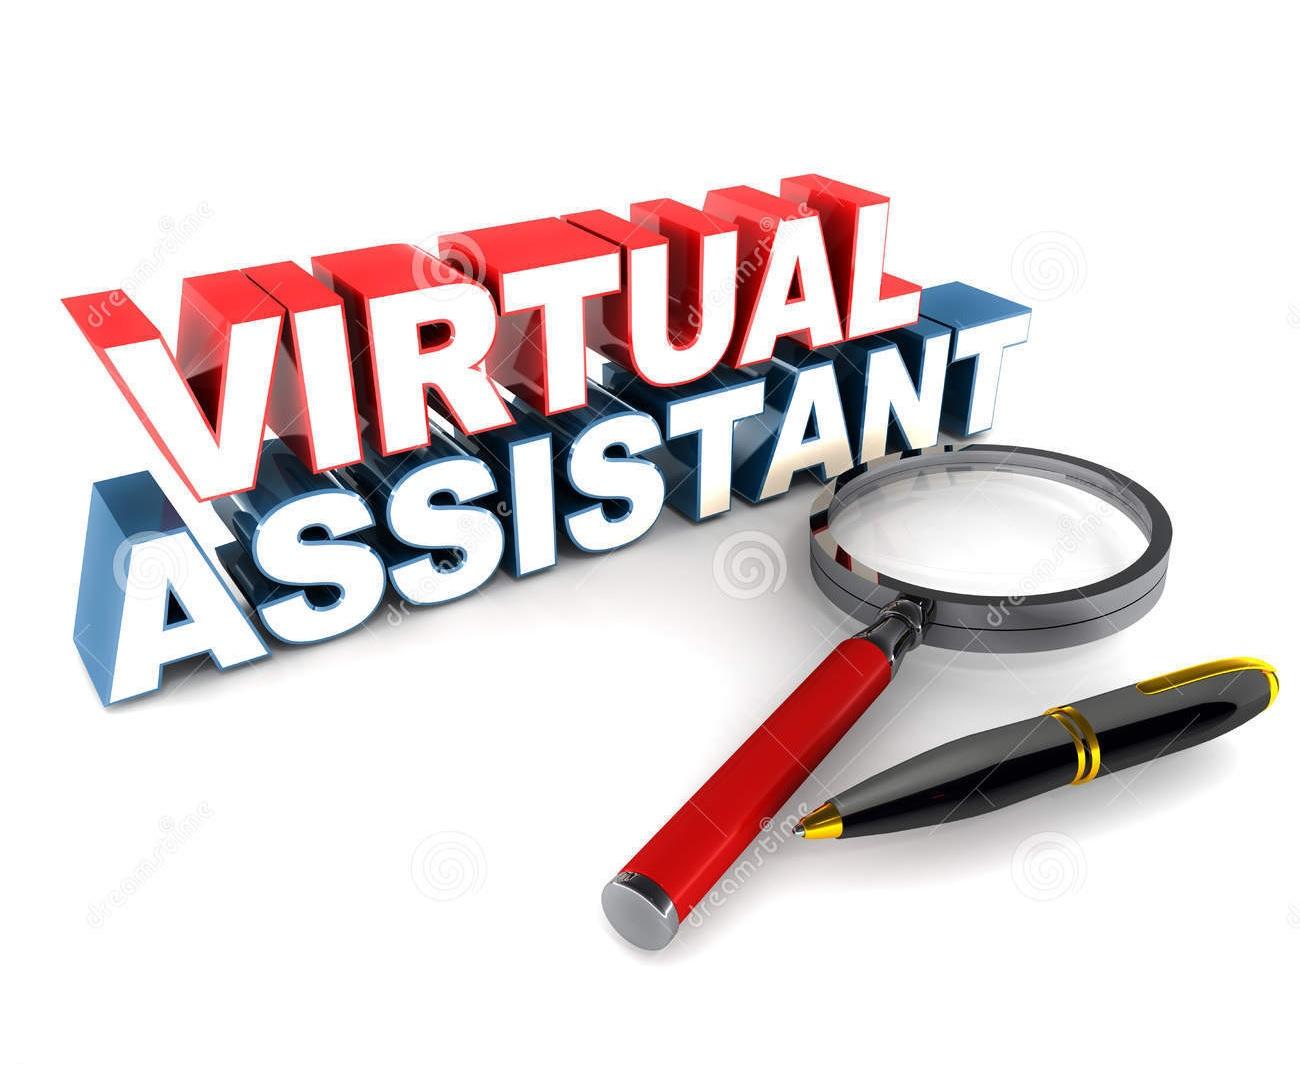 virtual assistant for Apple enrollment program